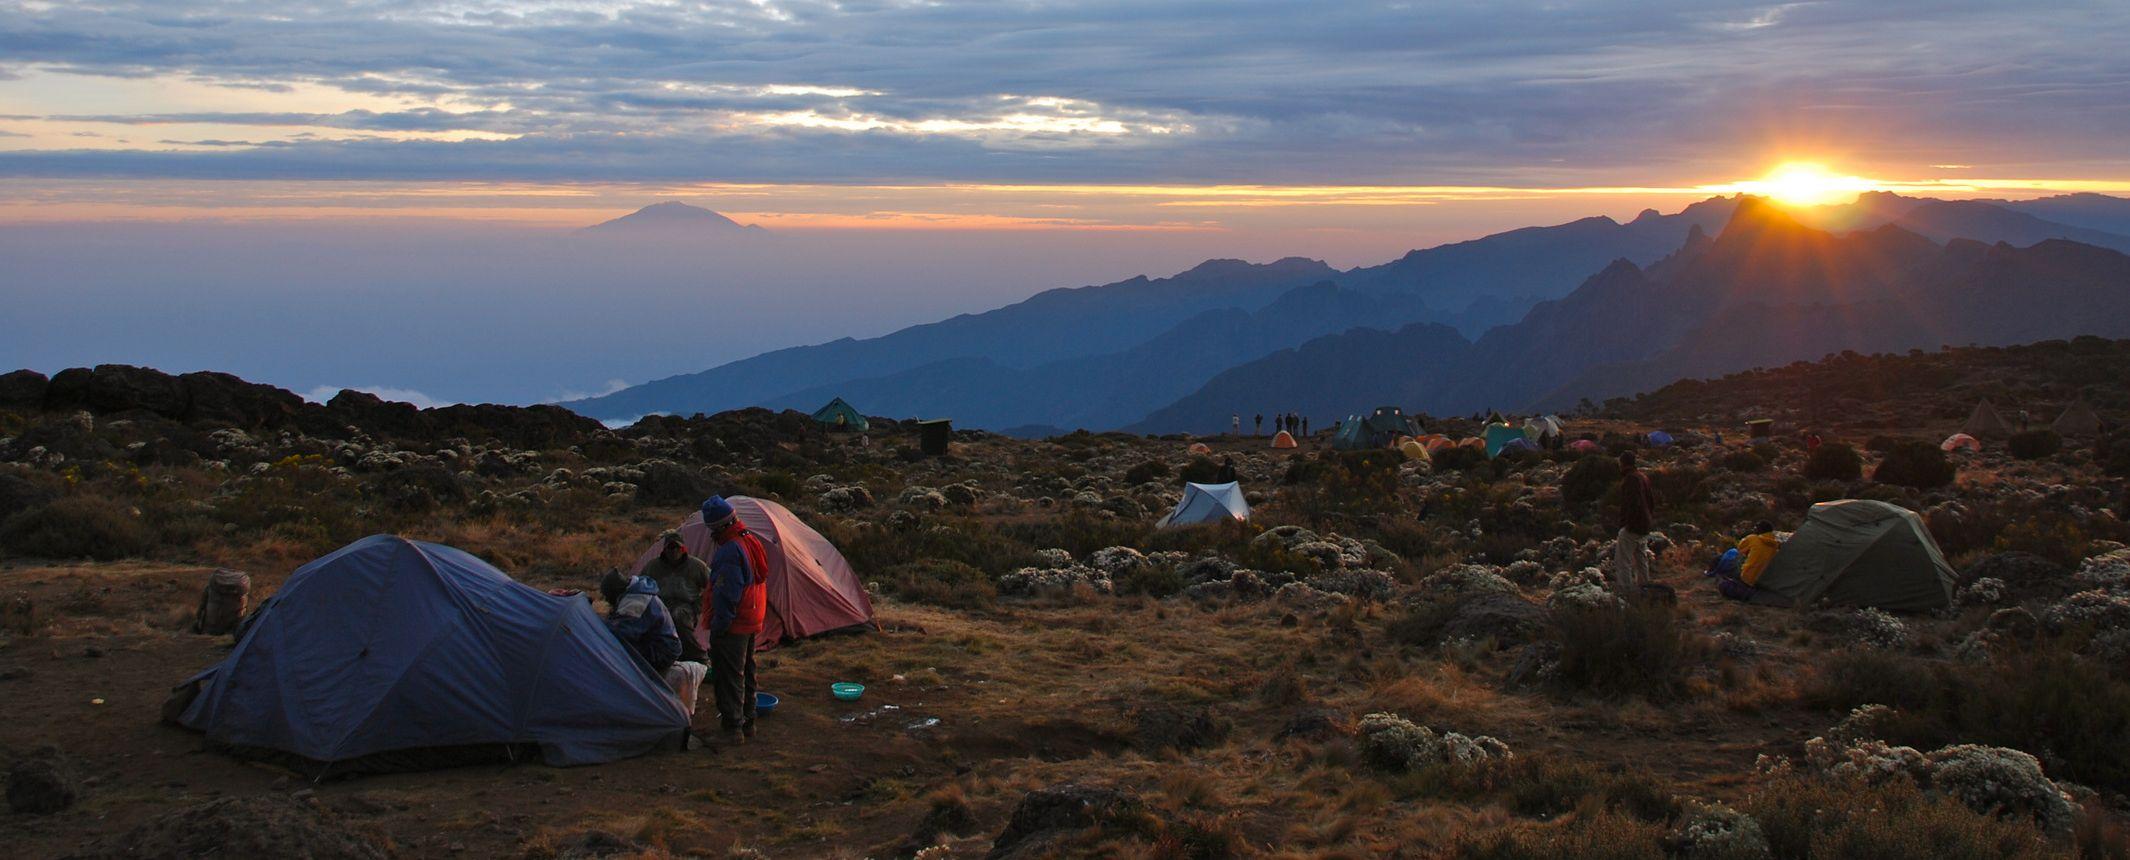 Ascensión al Kilimanjaro. Ruta Marangu   – Kili express. Salida 28 Dic